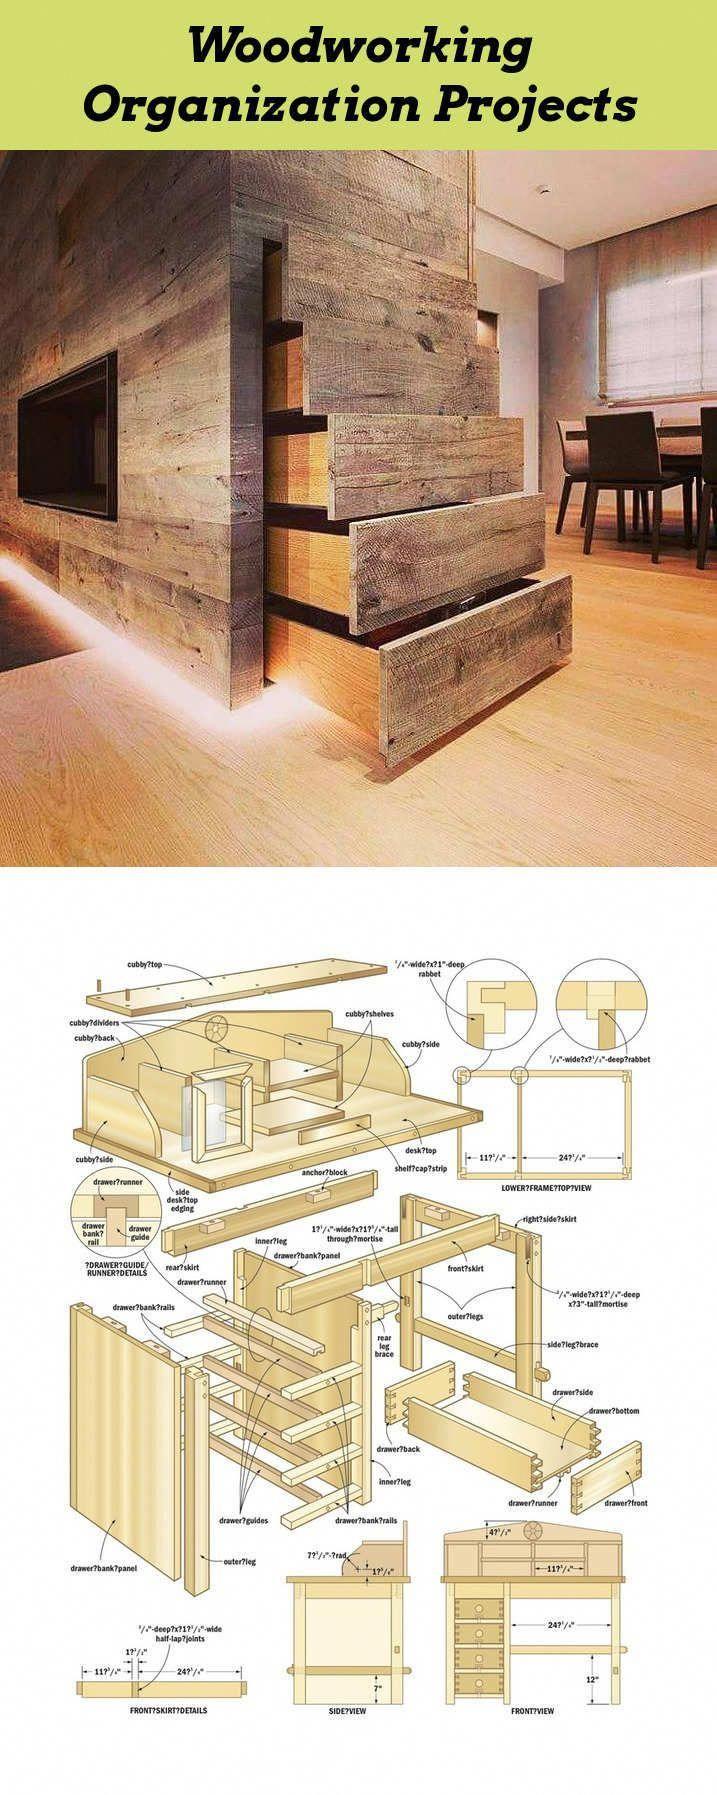 Einzel-schlafzimmer-wohndesign  woodworking plans pdf woodplanscountryliving  wood plans